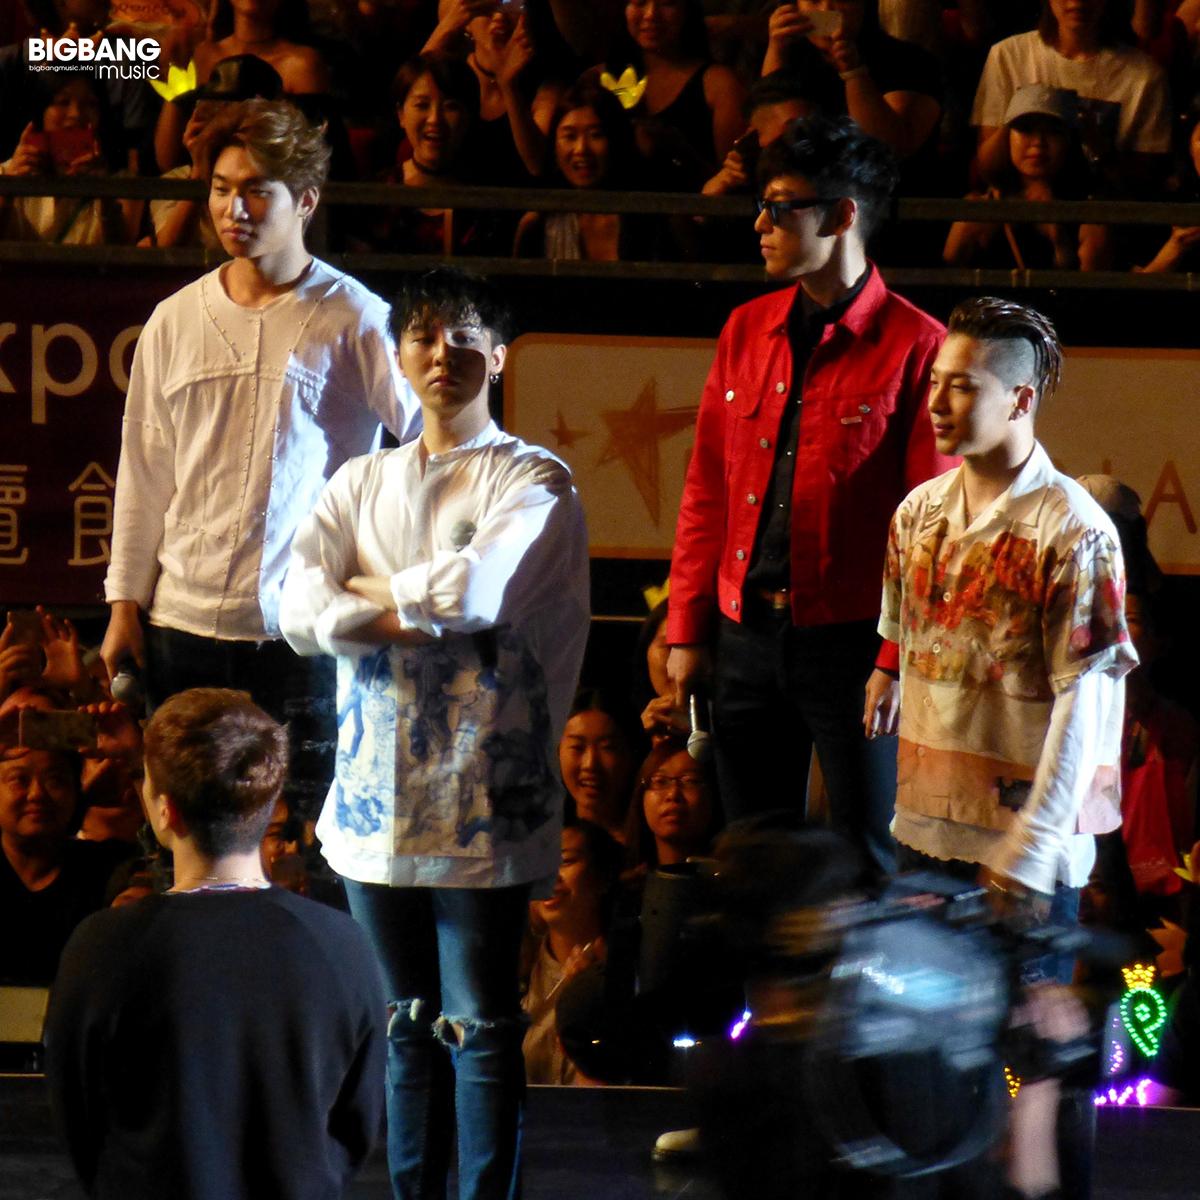 BIGBANGmusic-BIGBANG-FM-Hong-Kong-Day-2-2016-07-23-04